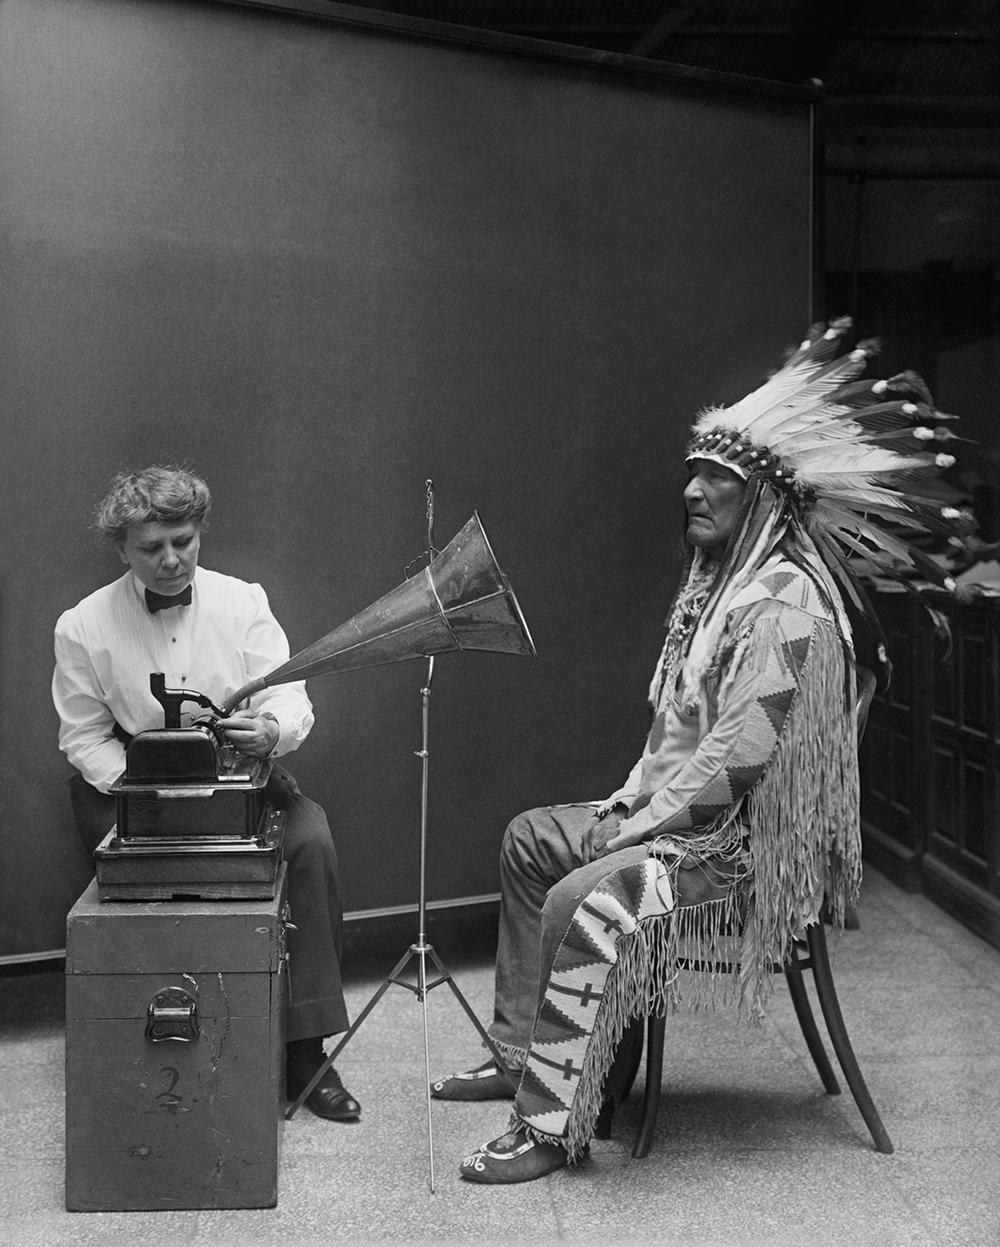 Photo: Recording Mountain Chief